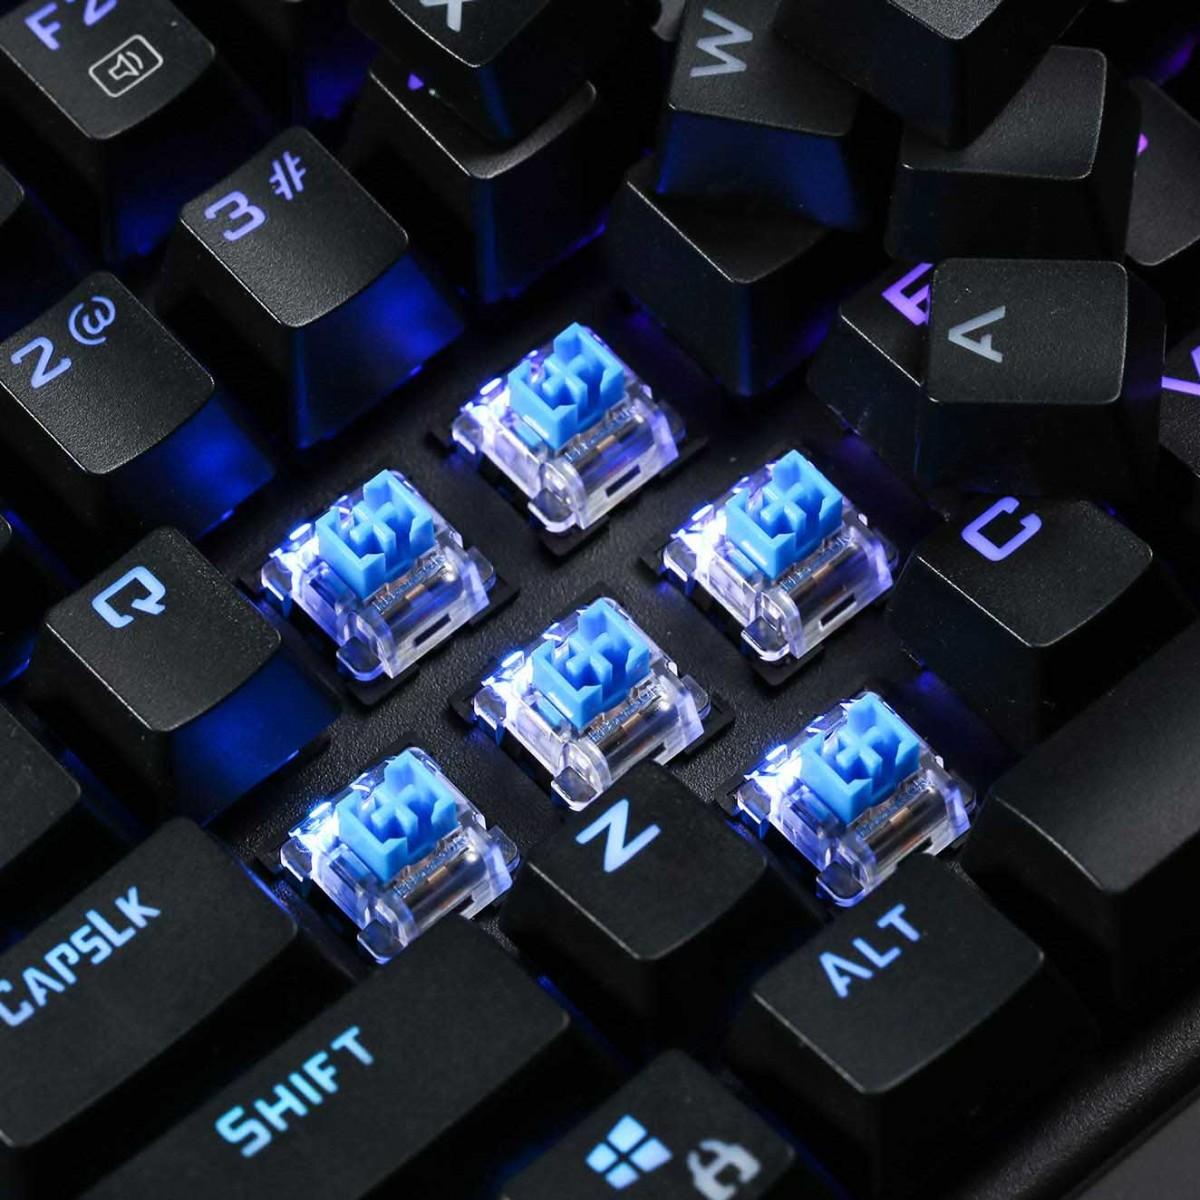 Teclado Mecânico Gamer Redragon K587 Magic-Wand RGB, Switch Azul, Black